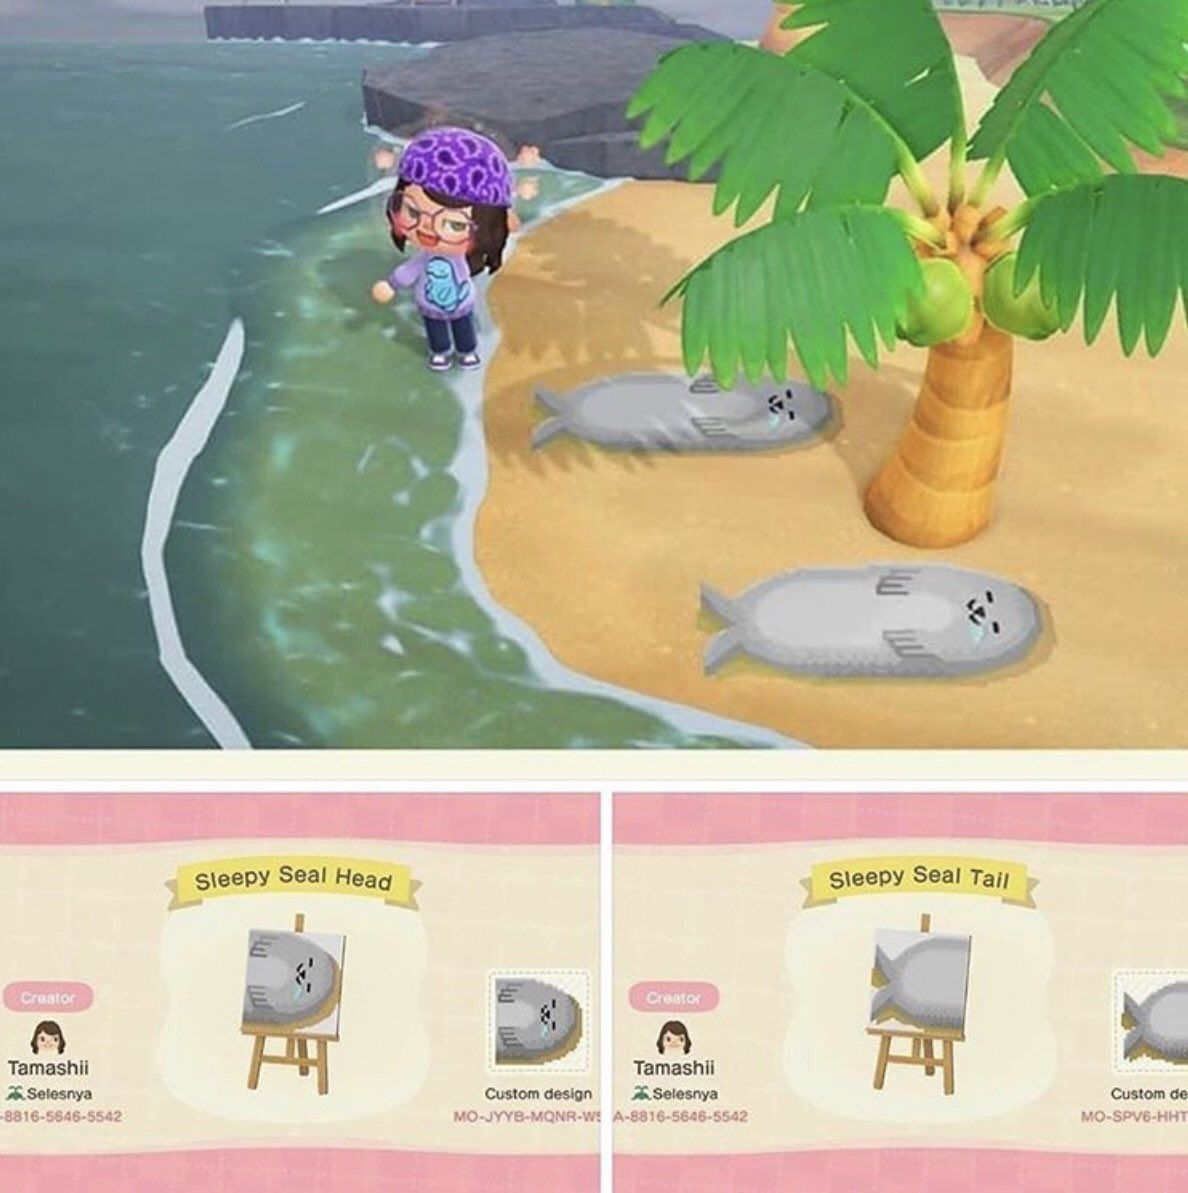 Acnh Designs On Twitter In 2020 Ausgestopftes Tier Animal Crossing 3ds Animal Crossing Charaktere